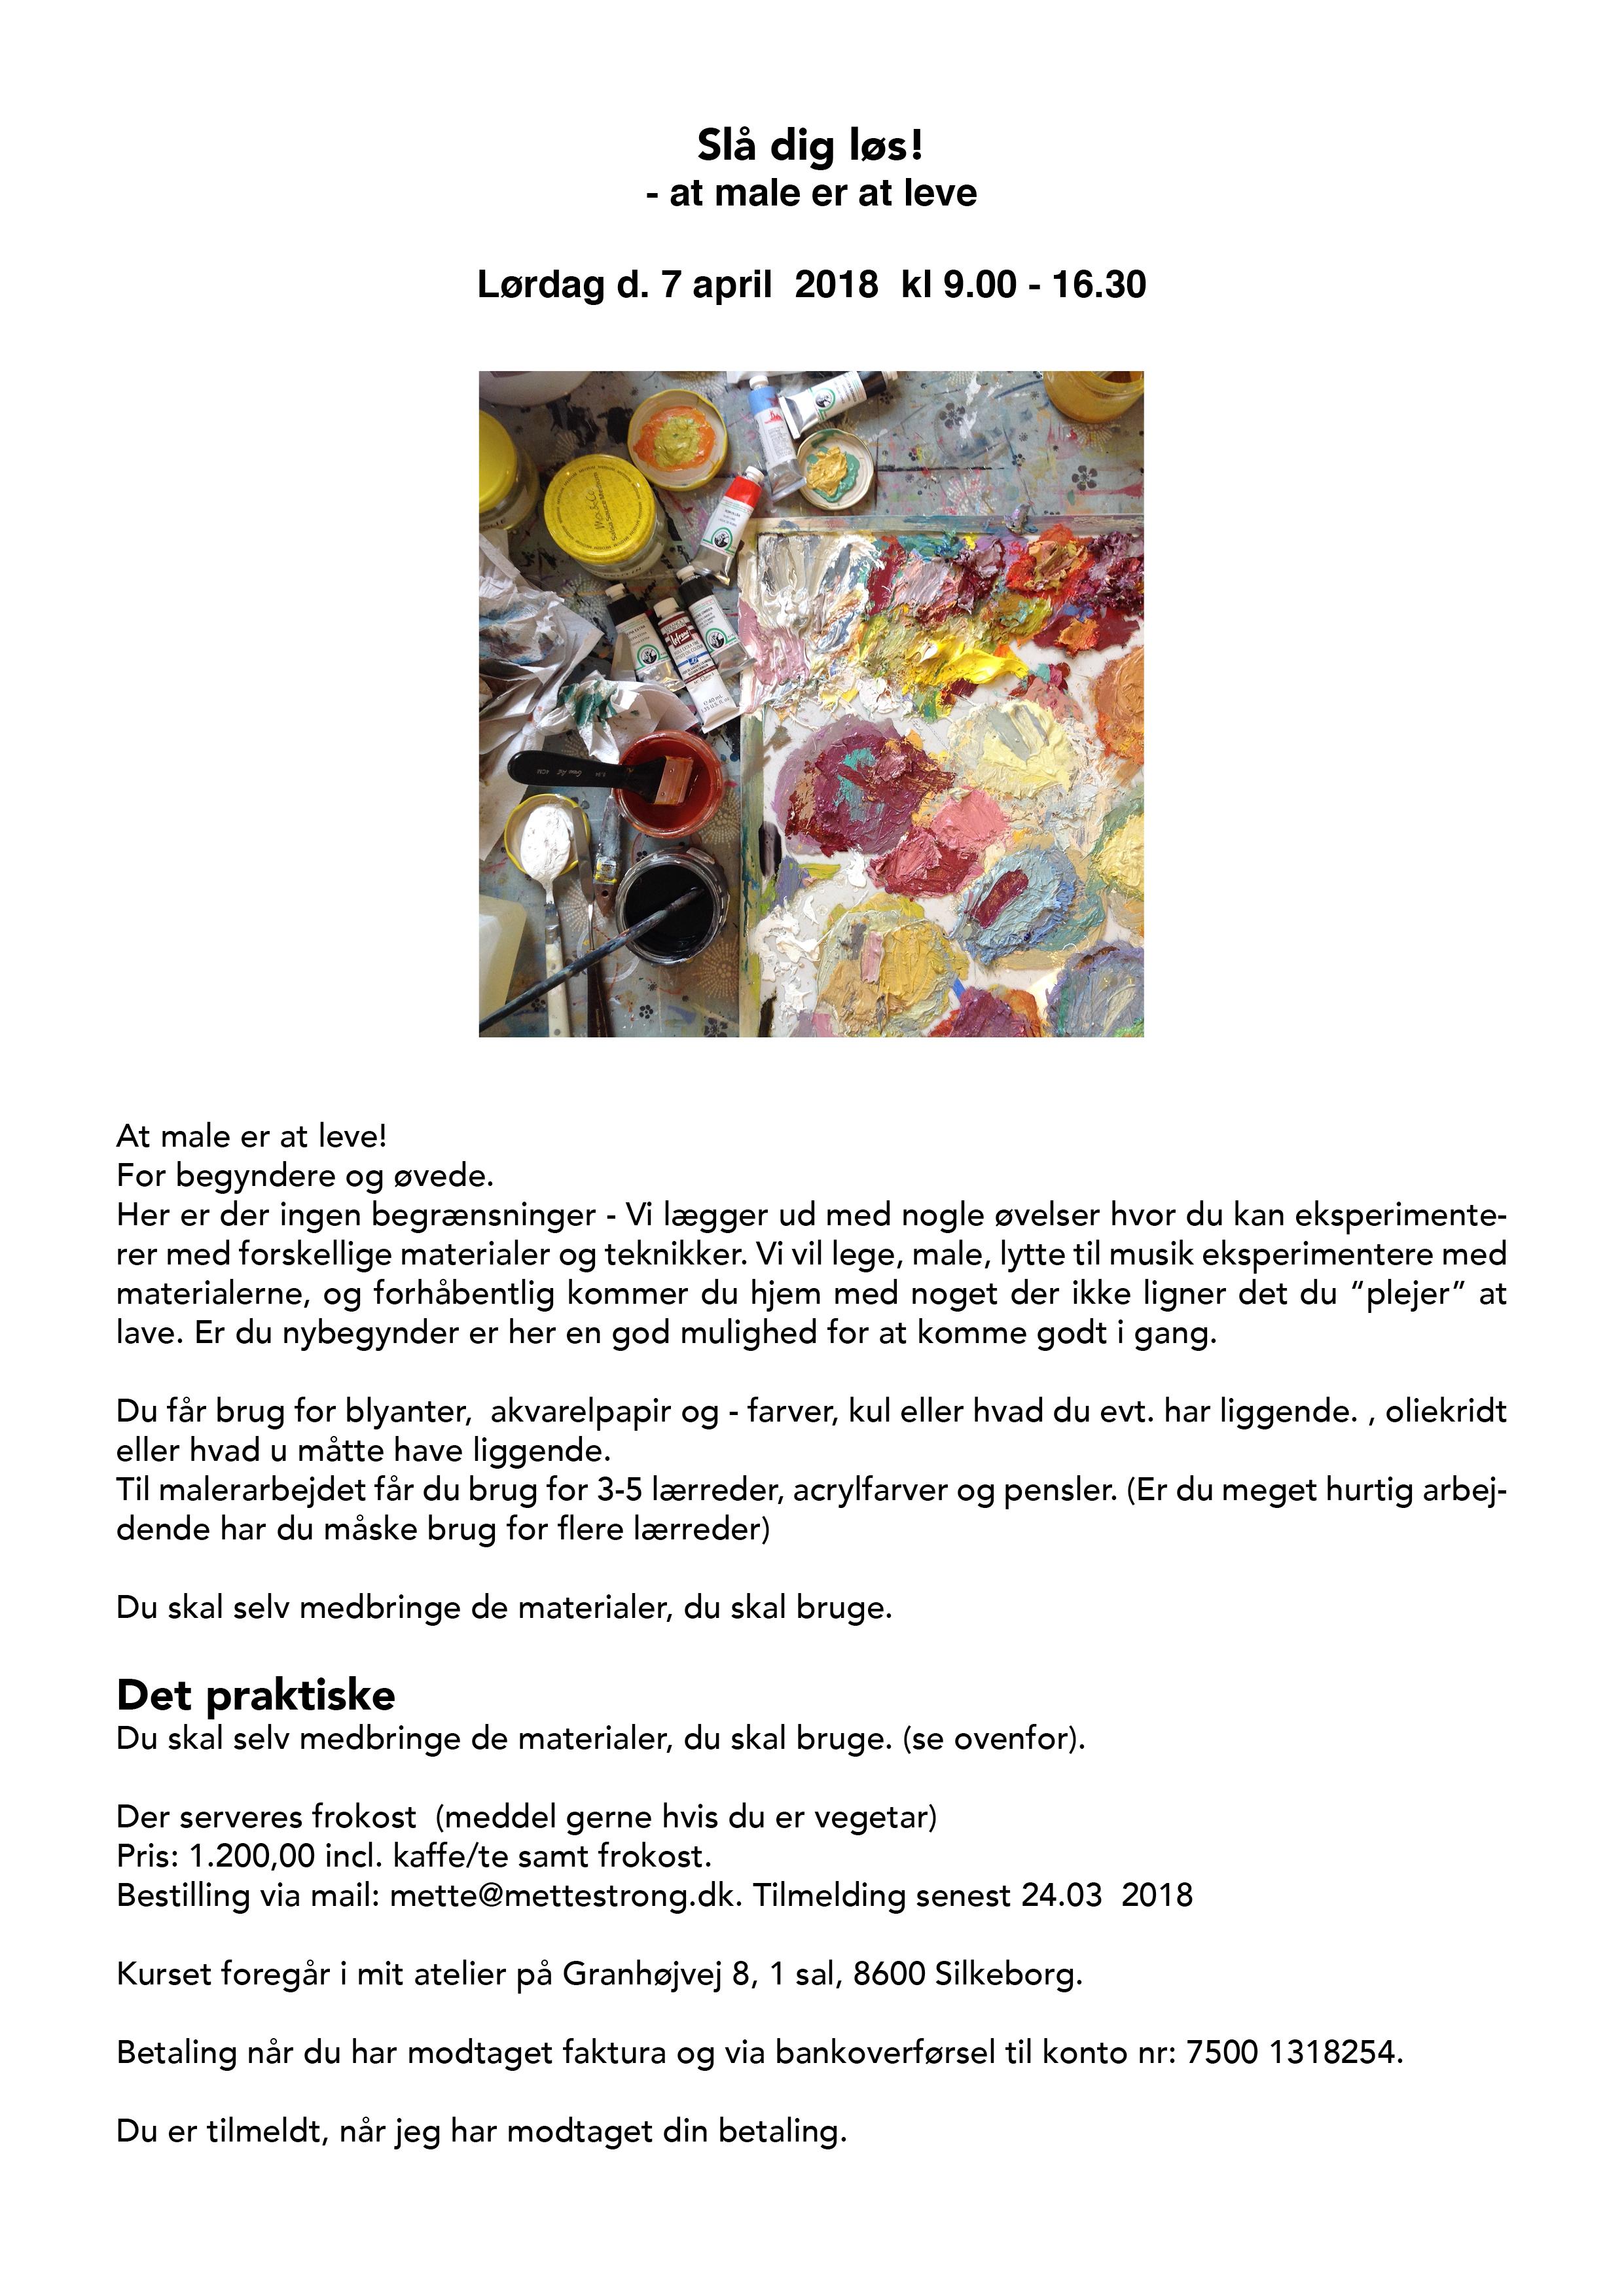 f9c16b753d06 SLÅ DIG LØS - AT MALE ER AT LEVE 07.04 2018 - METTE MAILUND ...